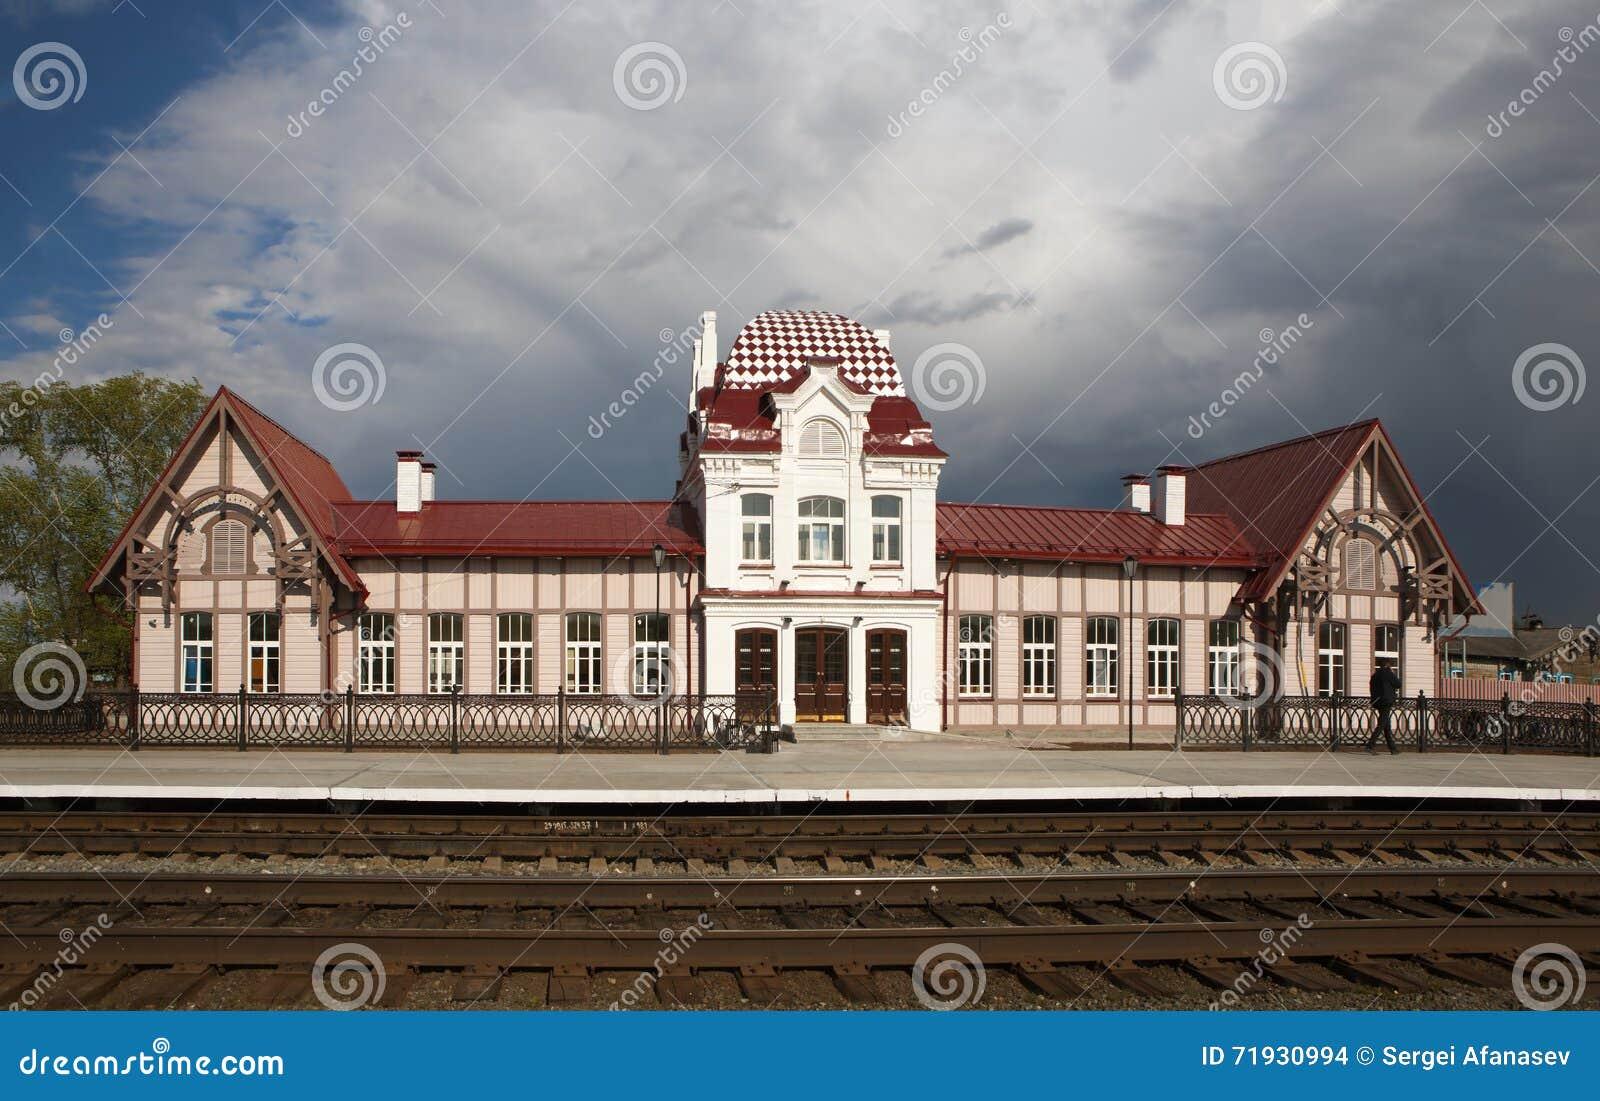 Вокзал Verkhoturye Россия